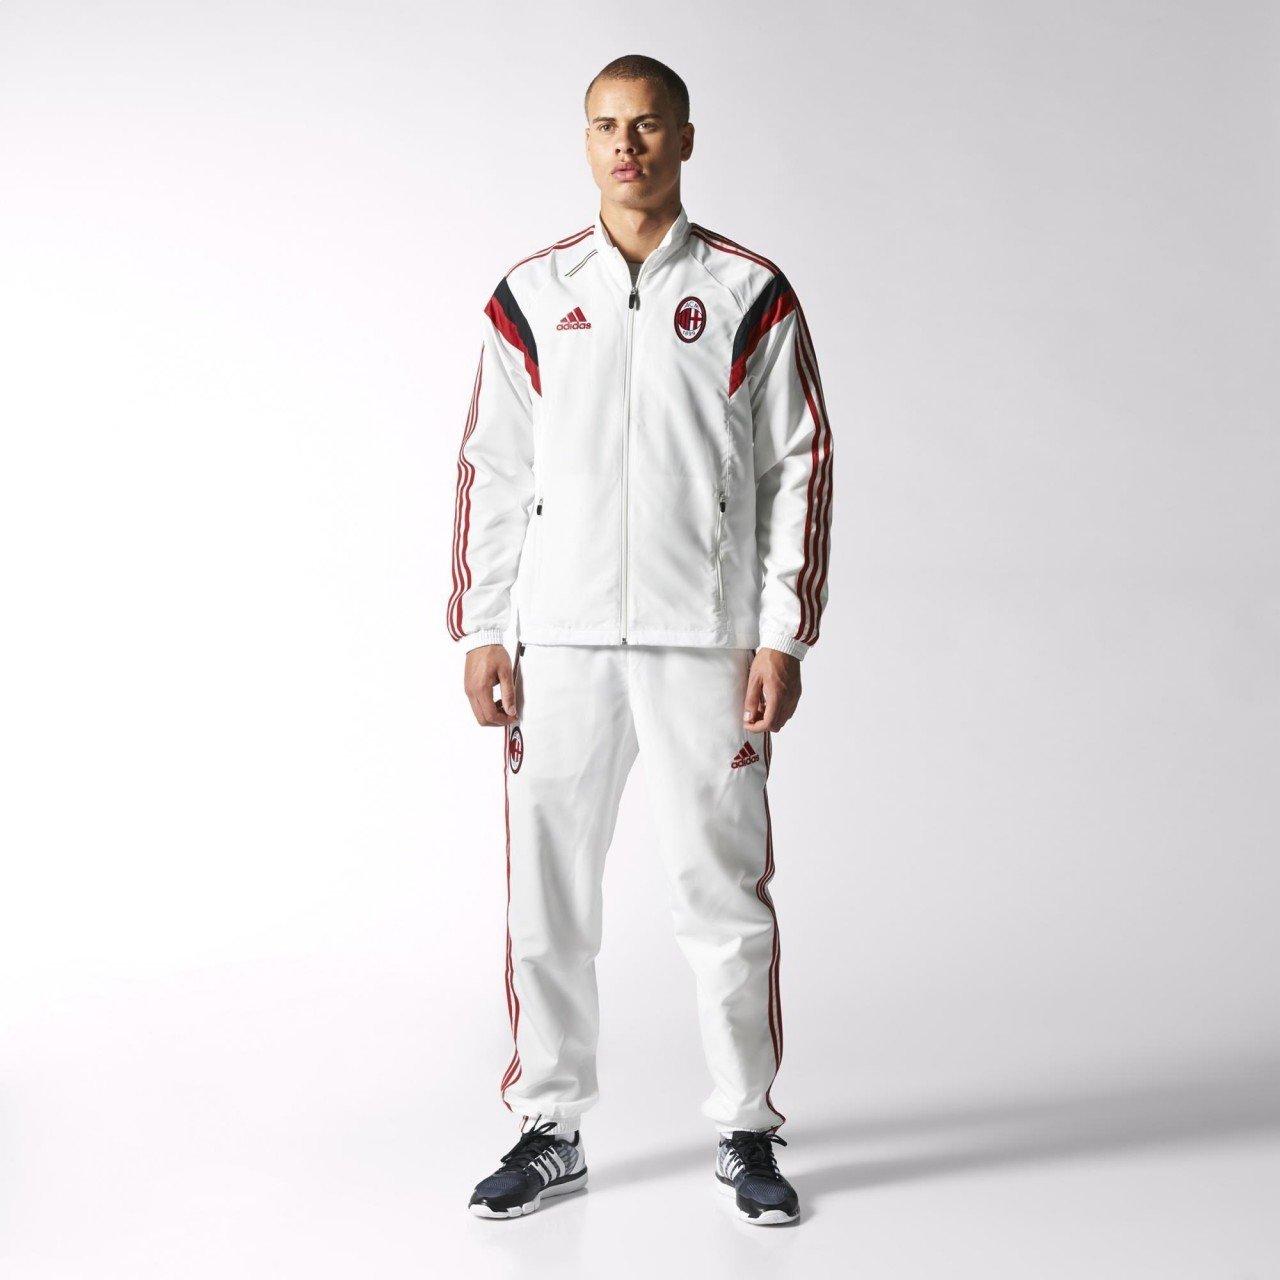 Adidas - MILAN CHANDAL PRESENTACION 14/15 color: Blanco talla: 2XL ...